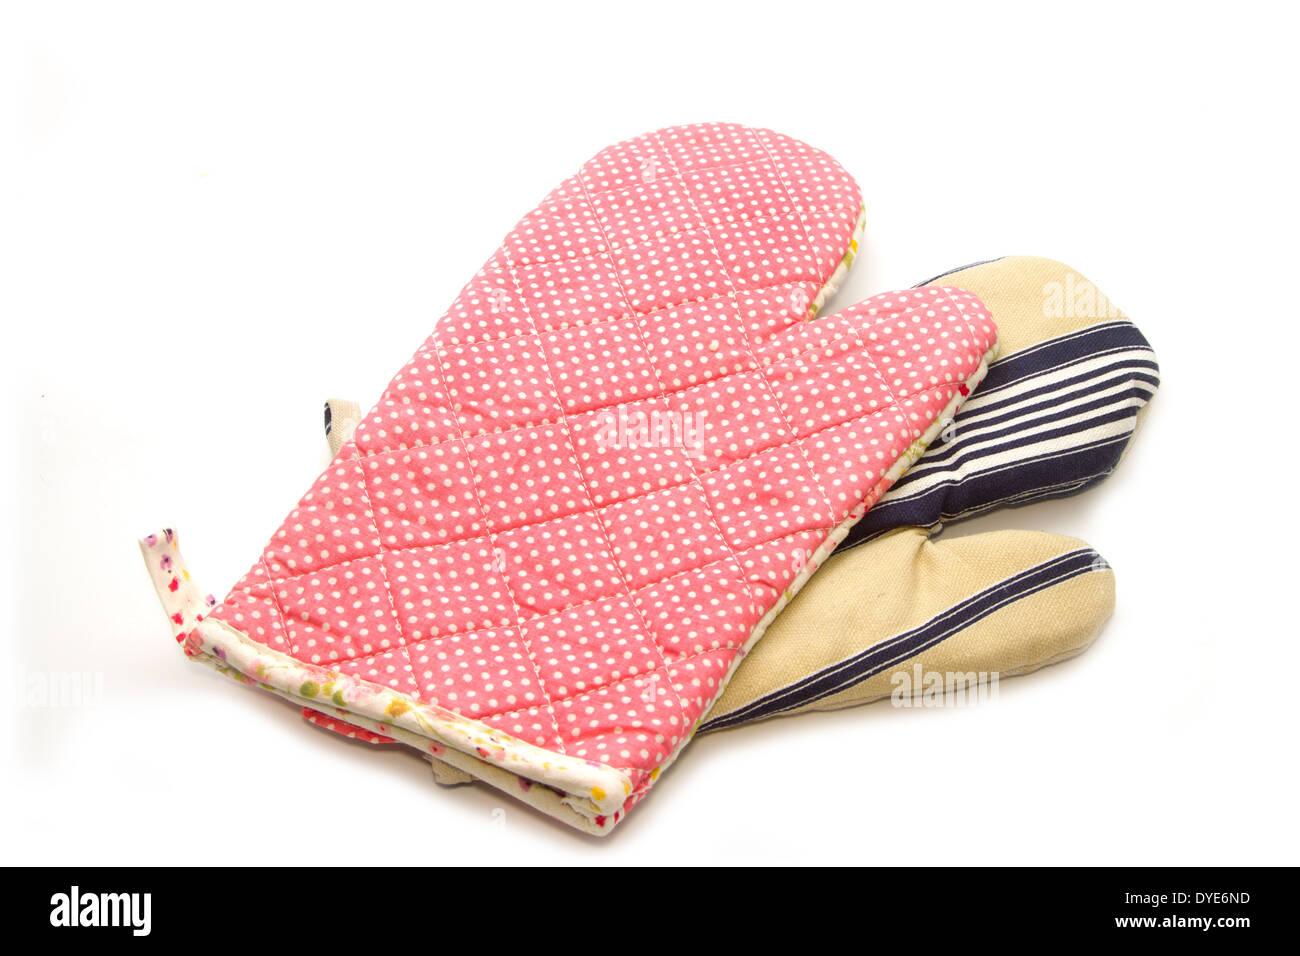 quilted heat protective mitten, kitchen utensils - Stock Image